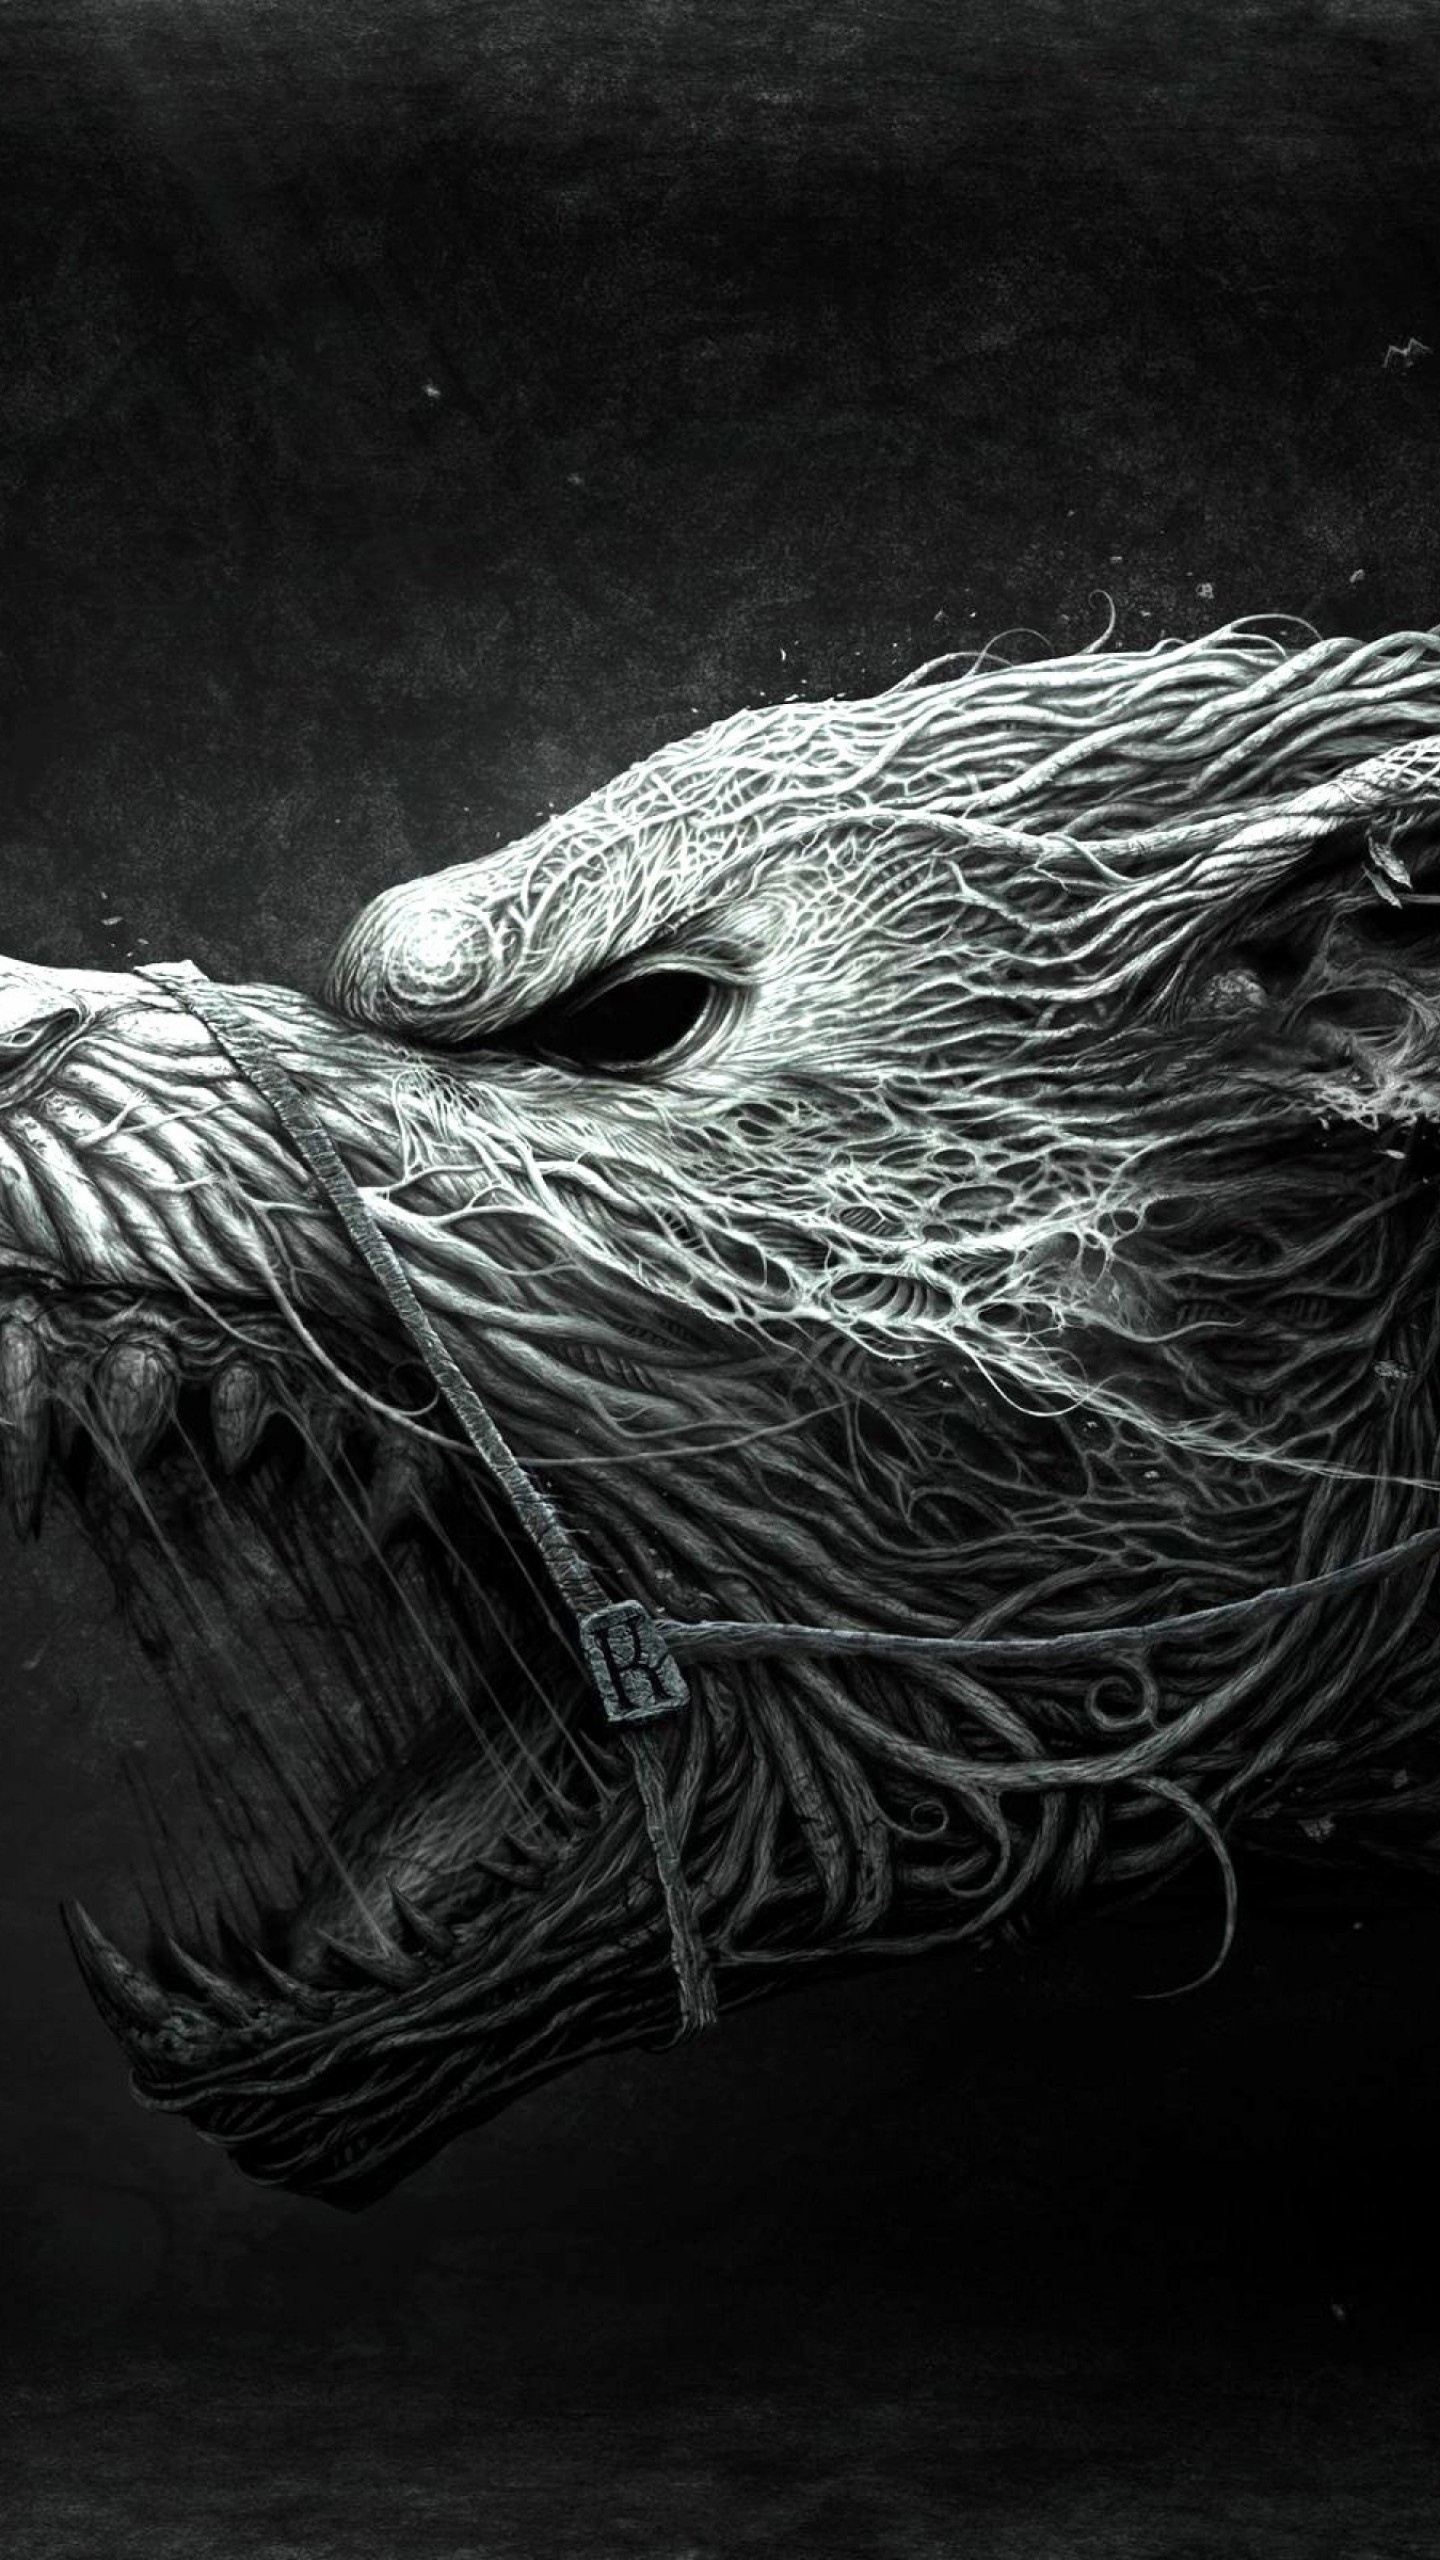 Wallpaper Wolf Hellhound Art Black And White Dangerous